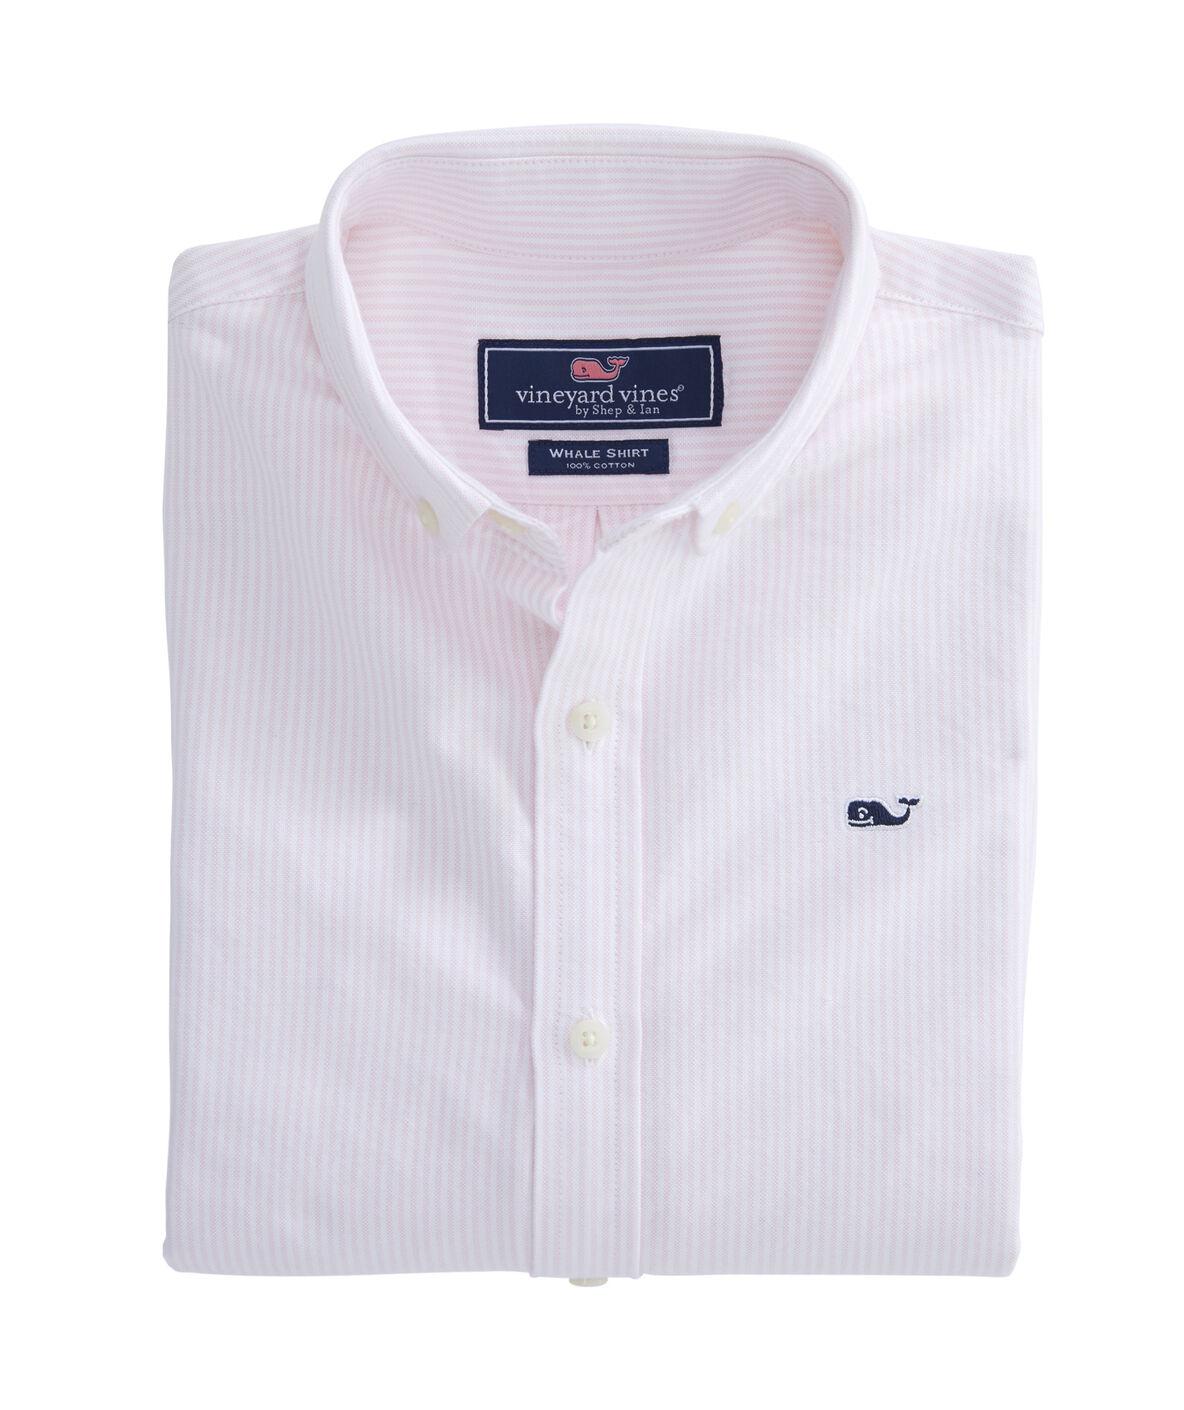 a783622327fd58 Shop Boys Fine Line Stripe Oxford Whale Shirt at vineyard vines